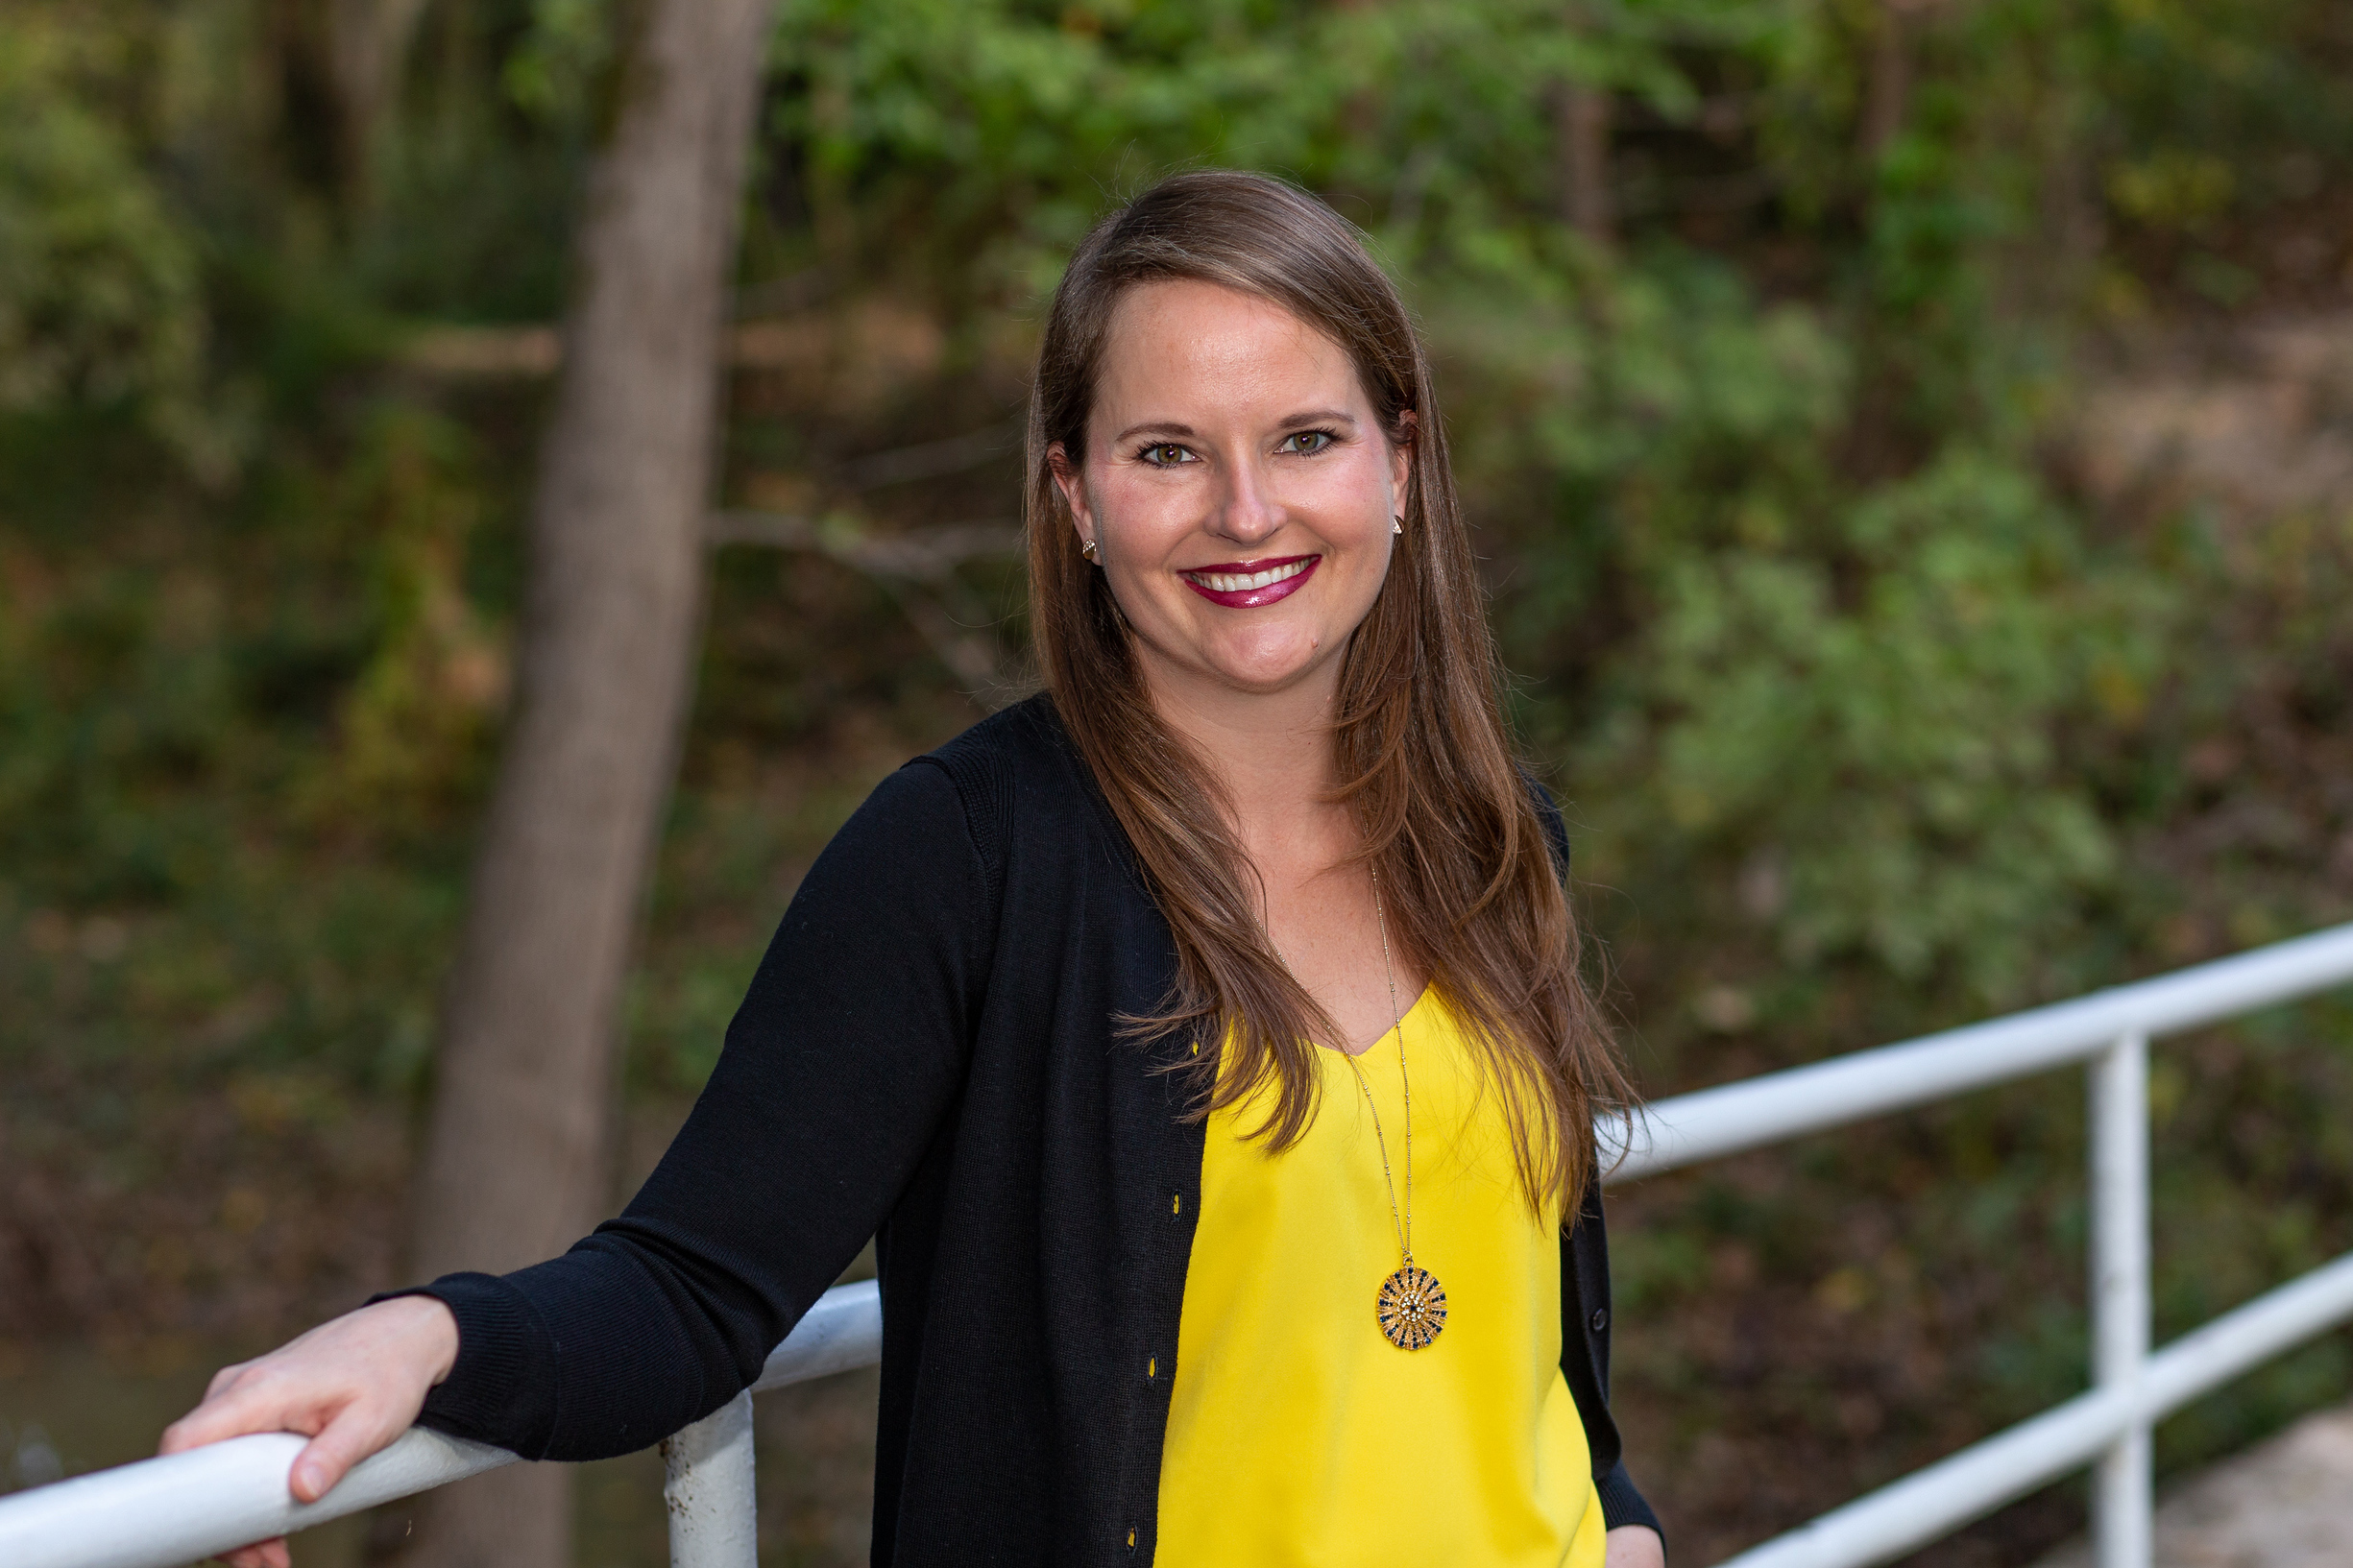 Dr. Jennifer Hughes